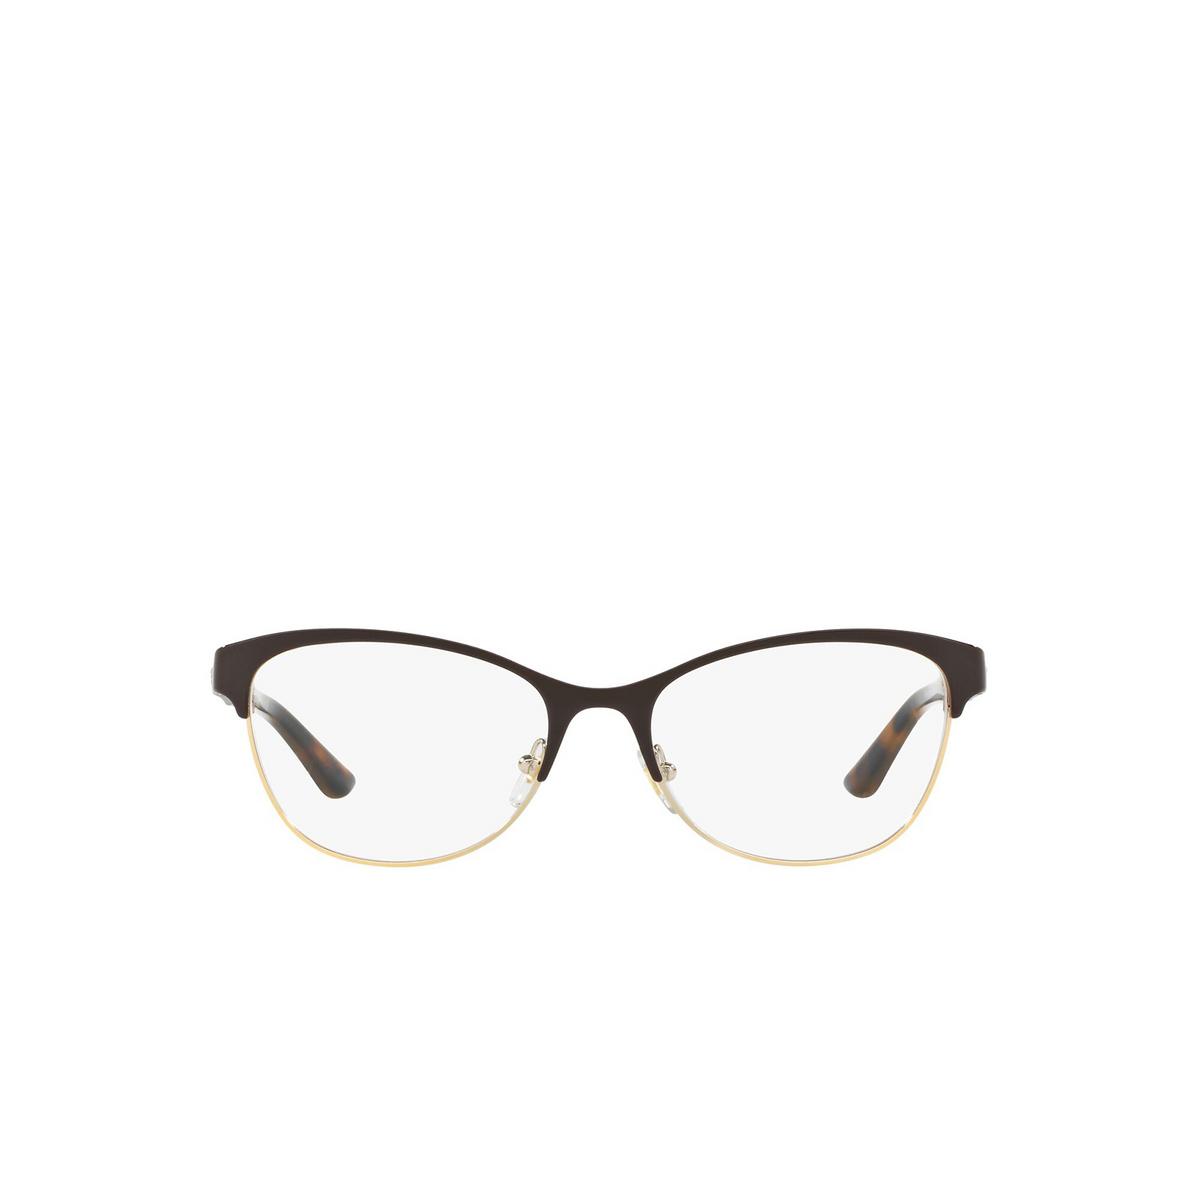 Versace® Cat-eye Eyeglasses: VE1233Q color Brown / Pale Gold 1344.